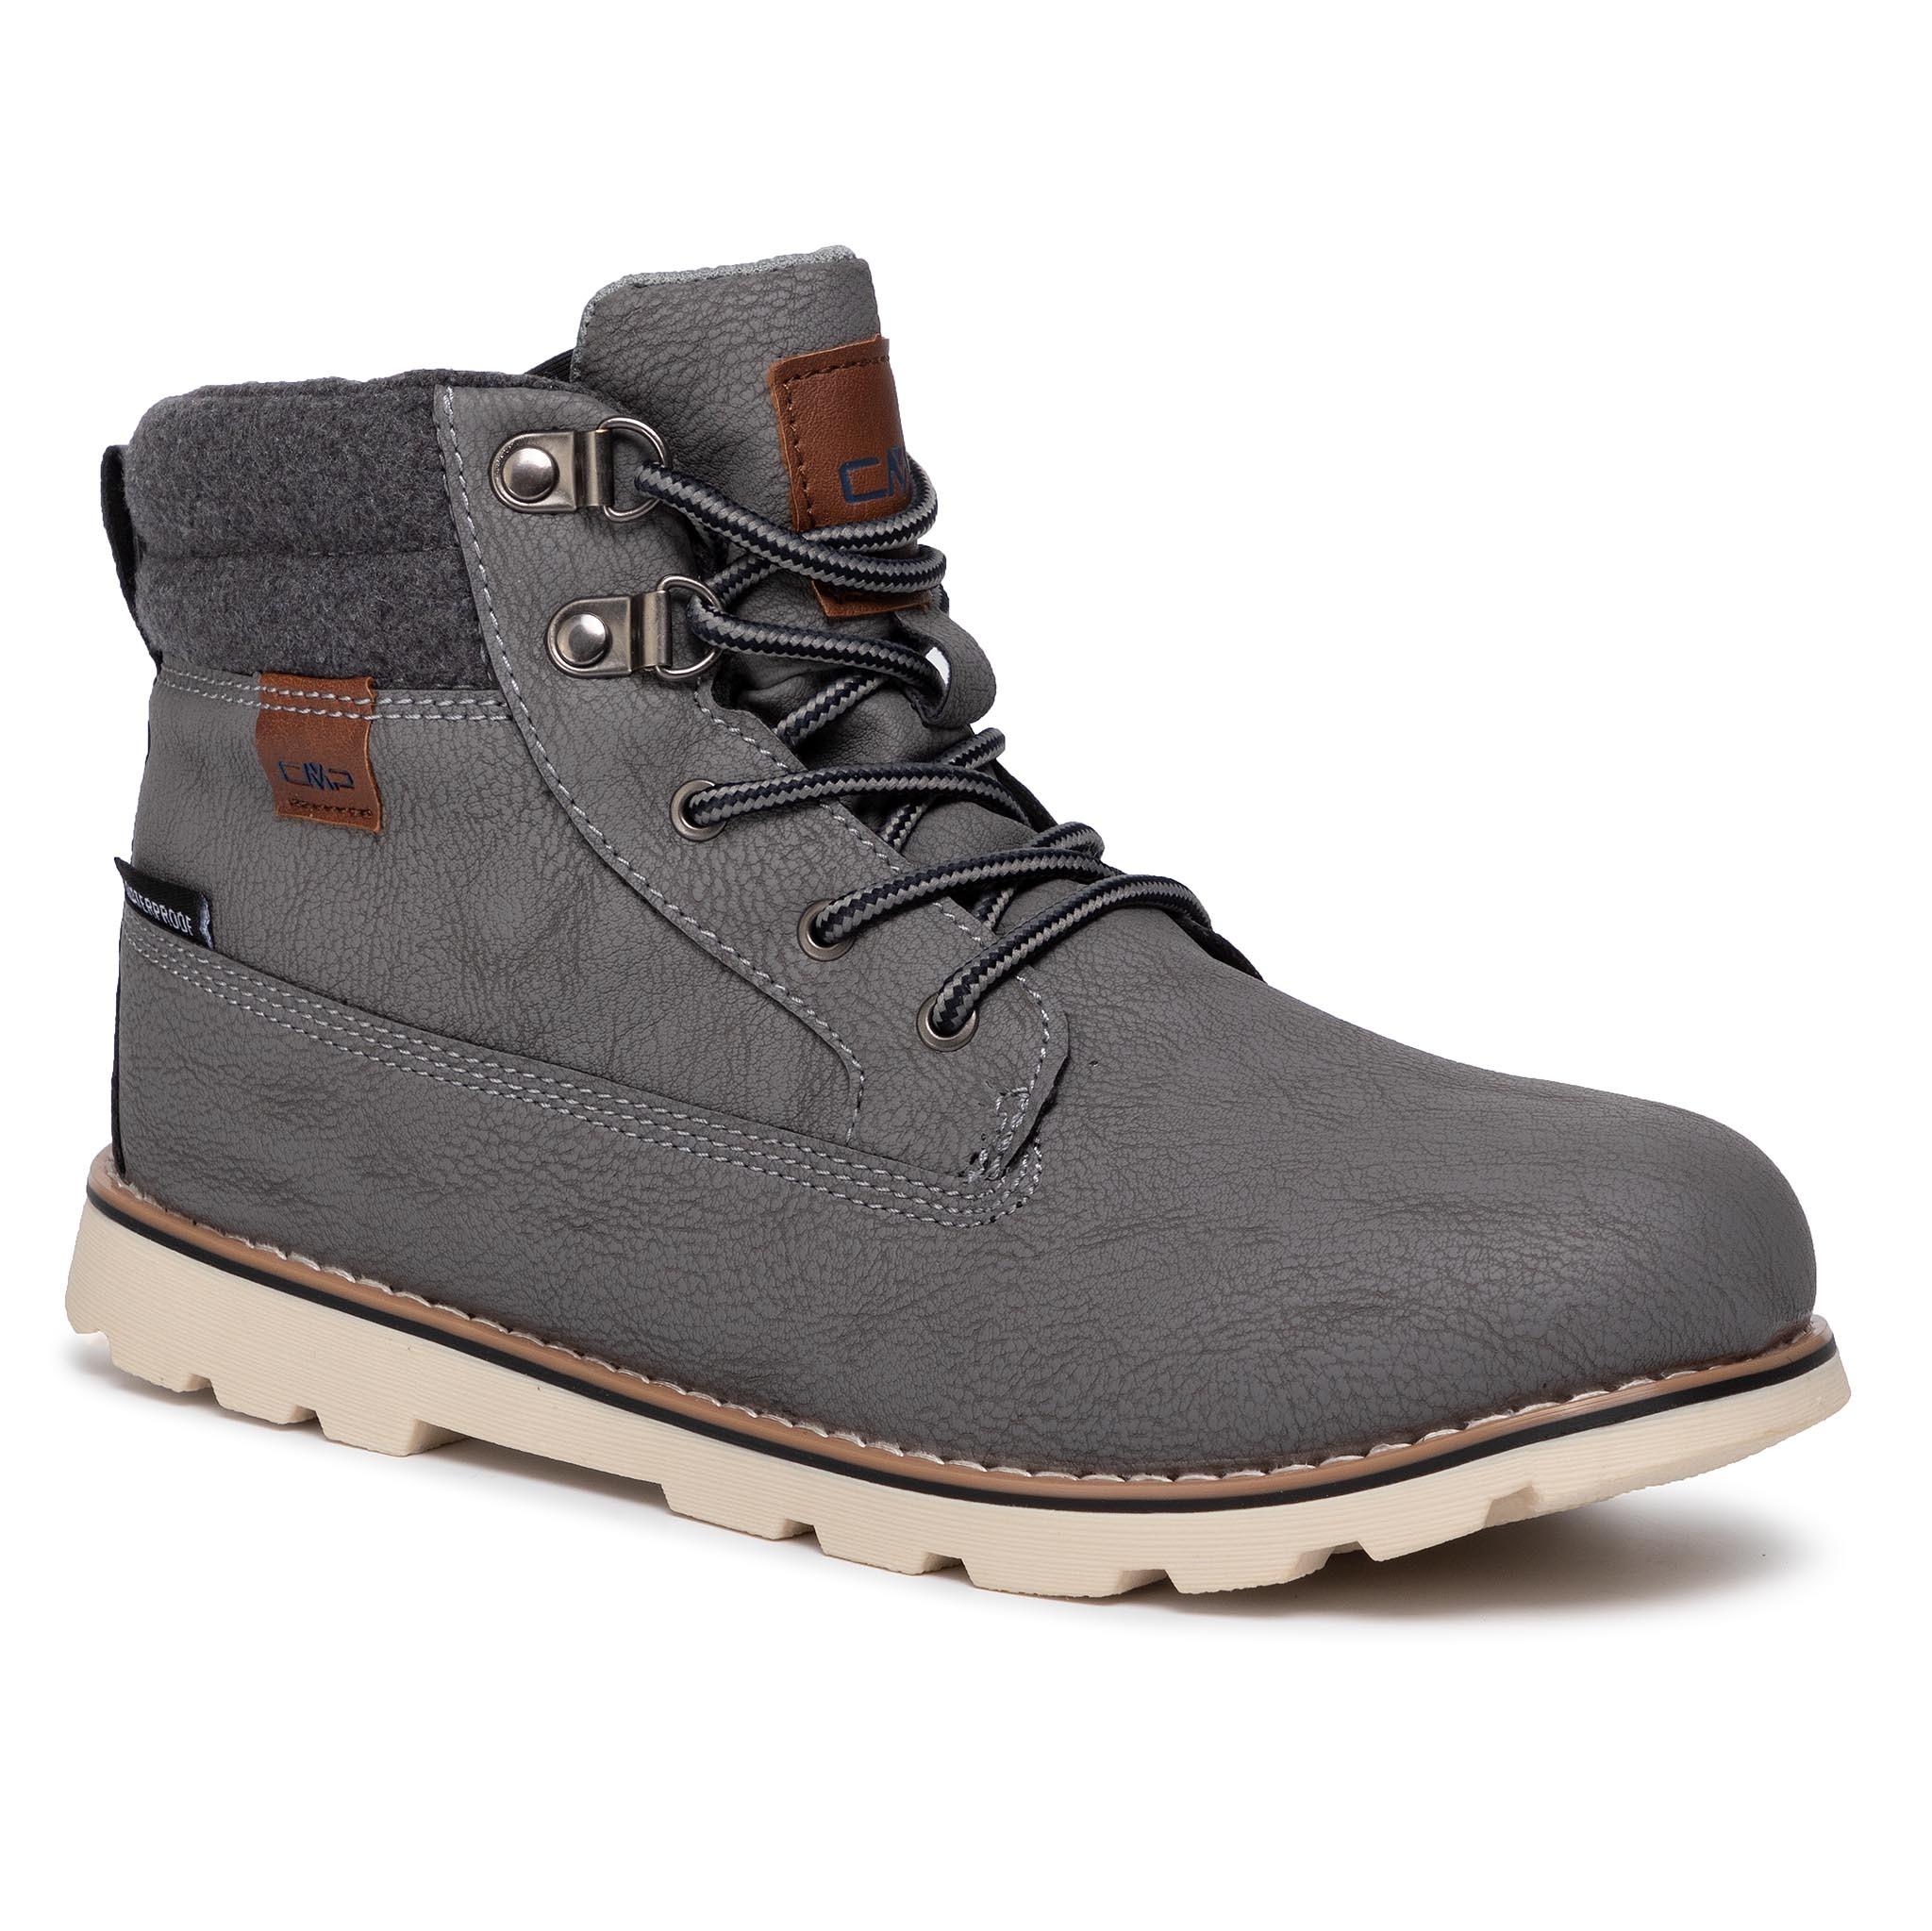 Ghete CMP - Kids Thuban Lifestyle Shoes Wp 39Q4944 Grey U739